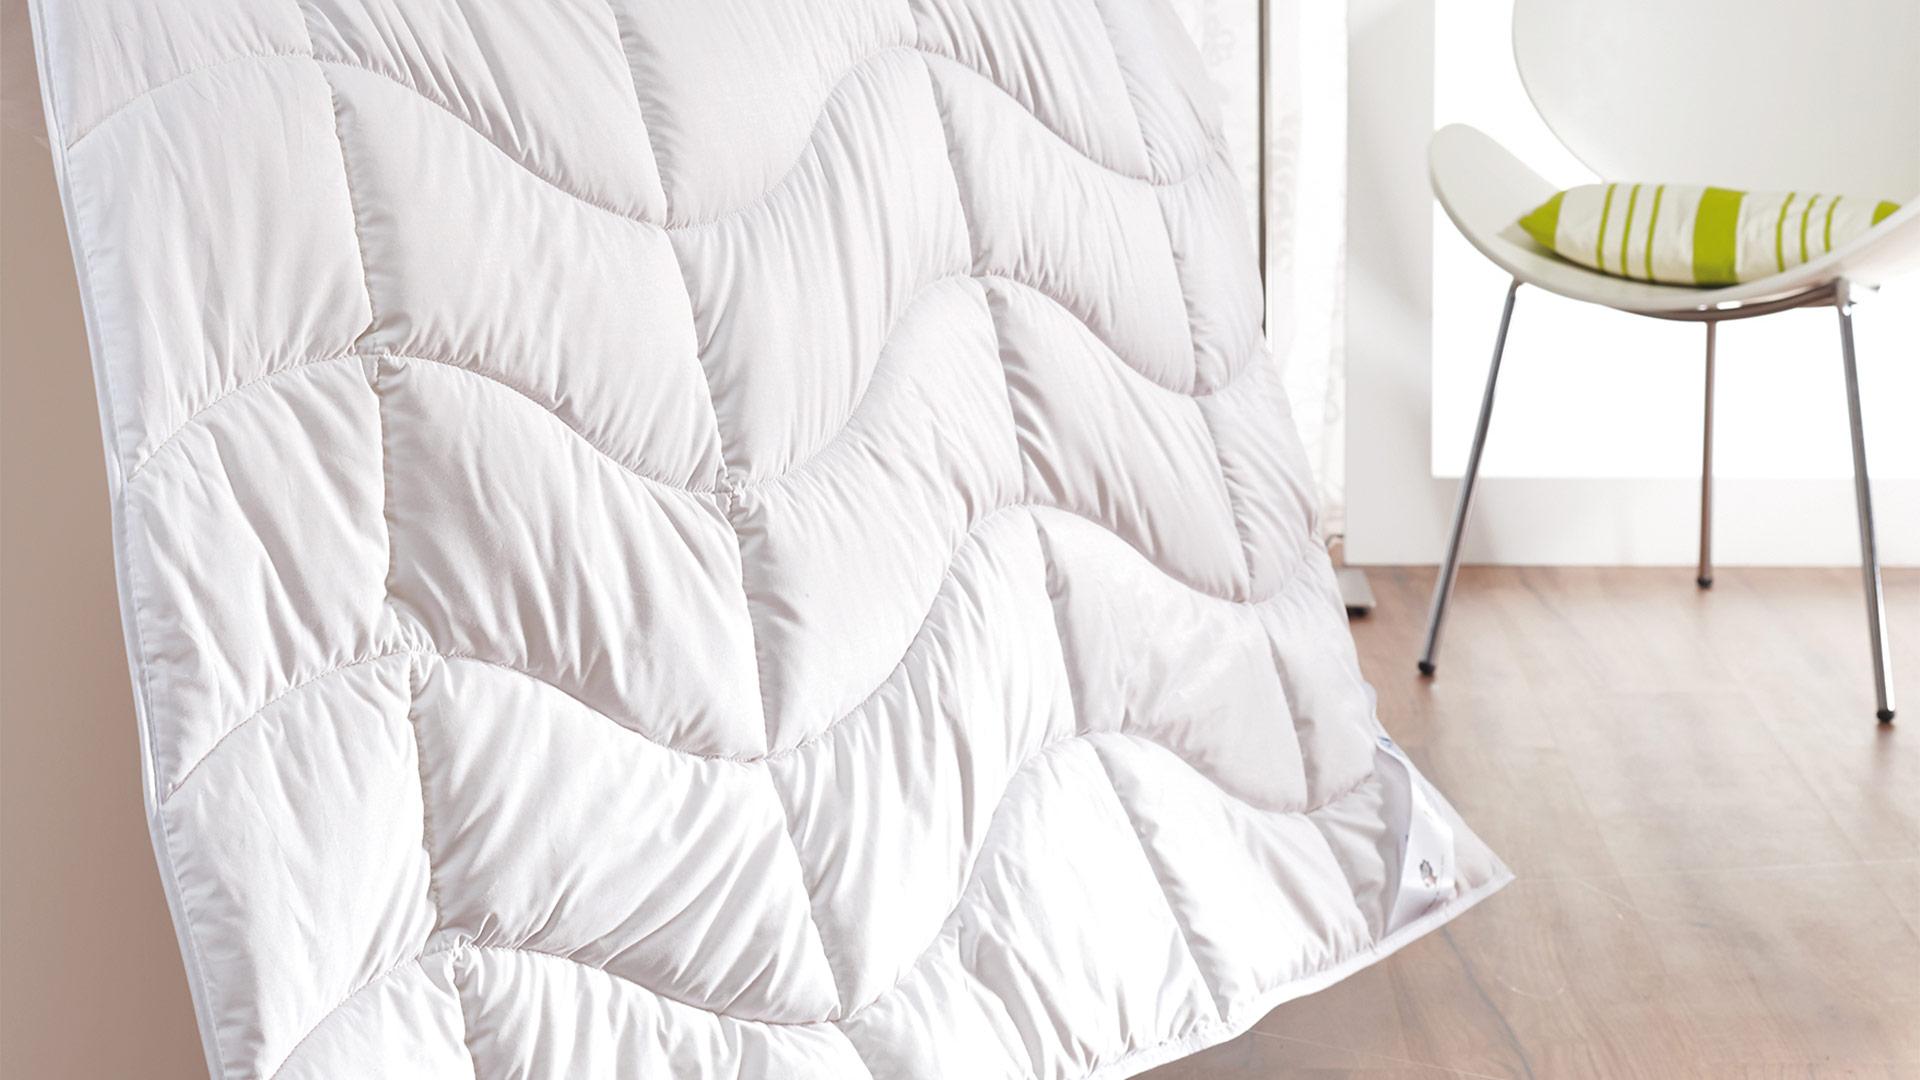 naturhaardecken bettenhaus uwe heintzen. Black Bedroom Furniture Sets. Home Design Ideas